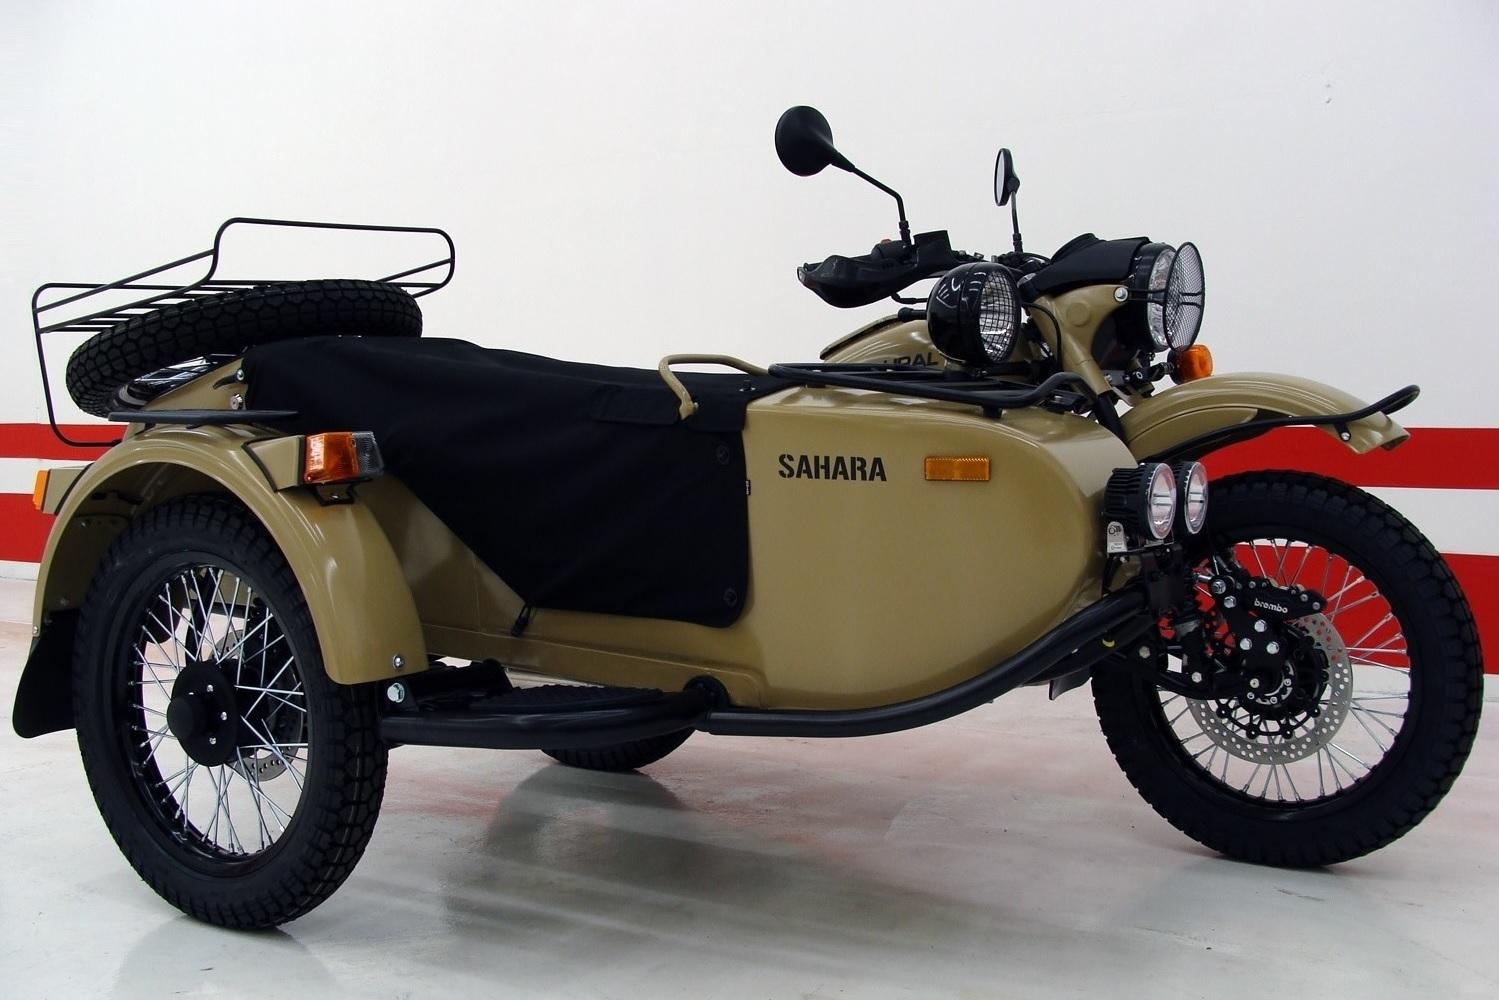 2017 Ural Gear Up Sahara Edition (2WD)